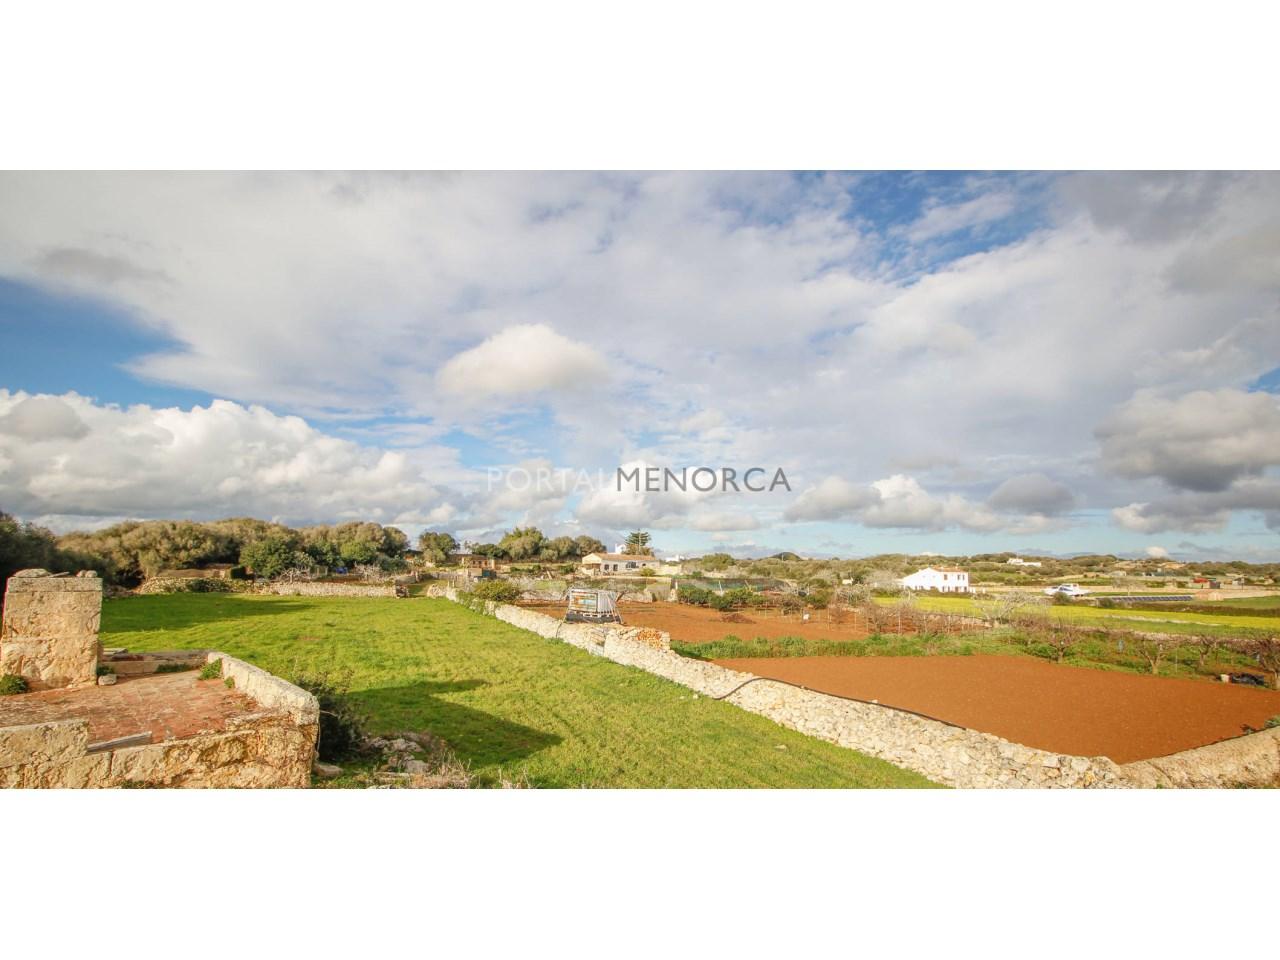 Casa de campo en venta con gran terreno cerca de Alaior